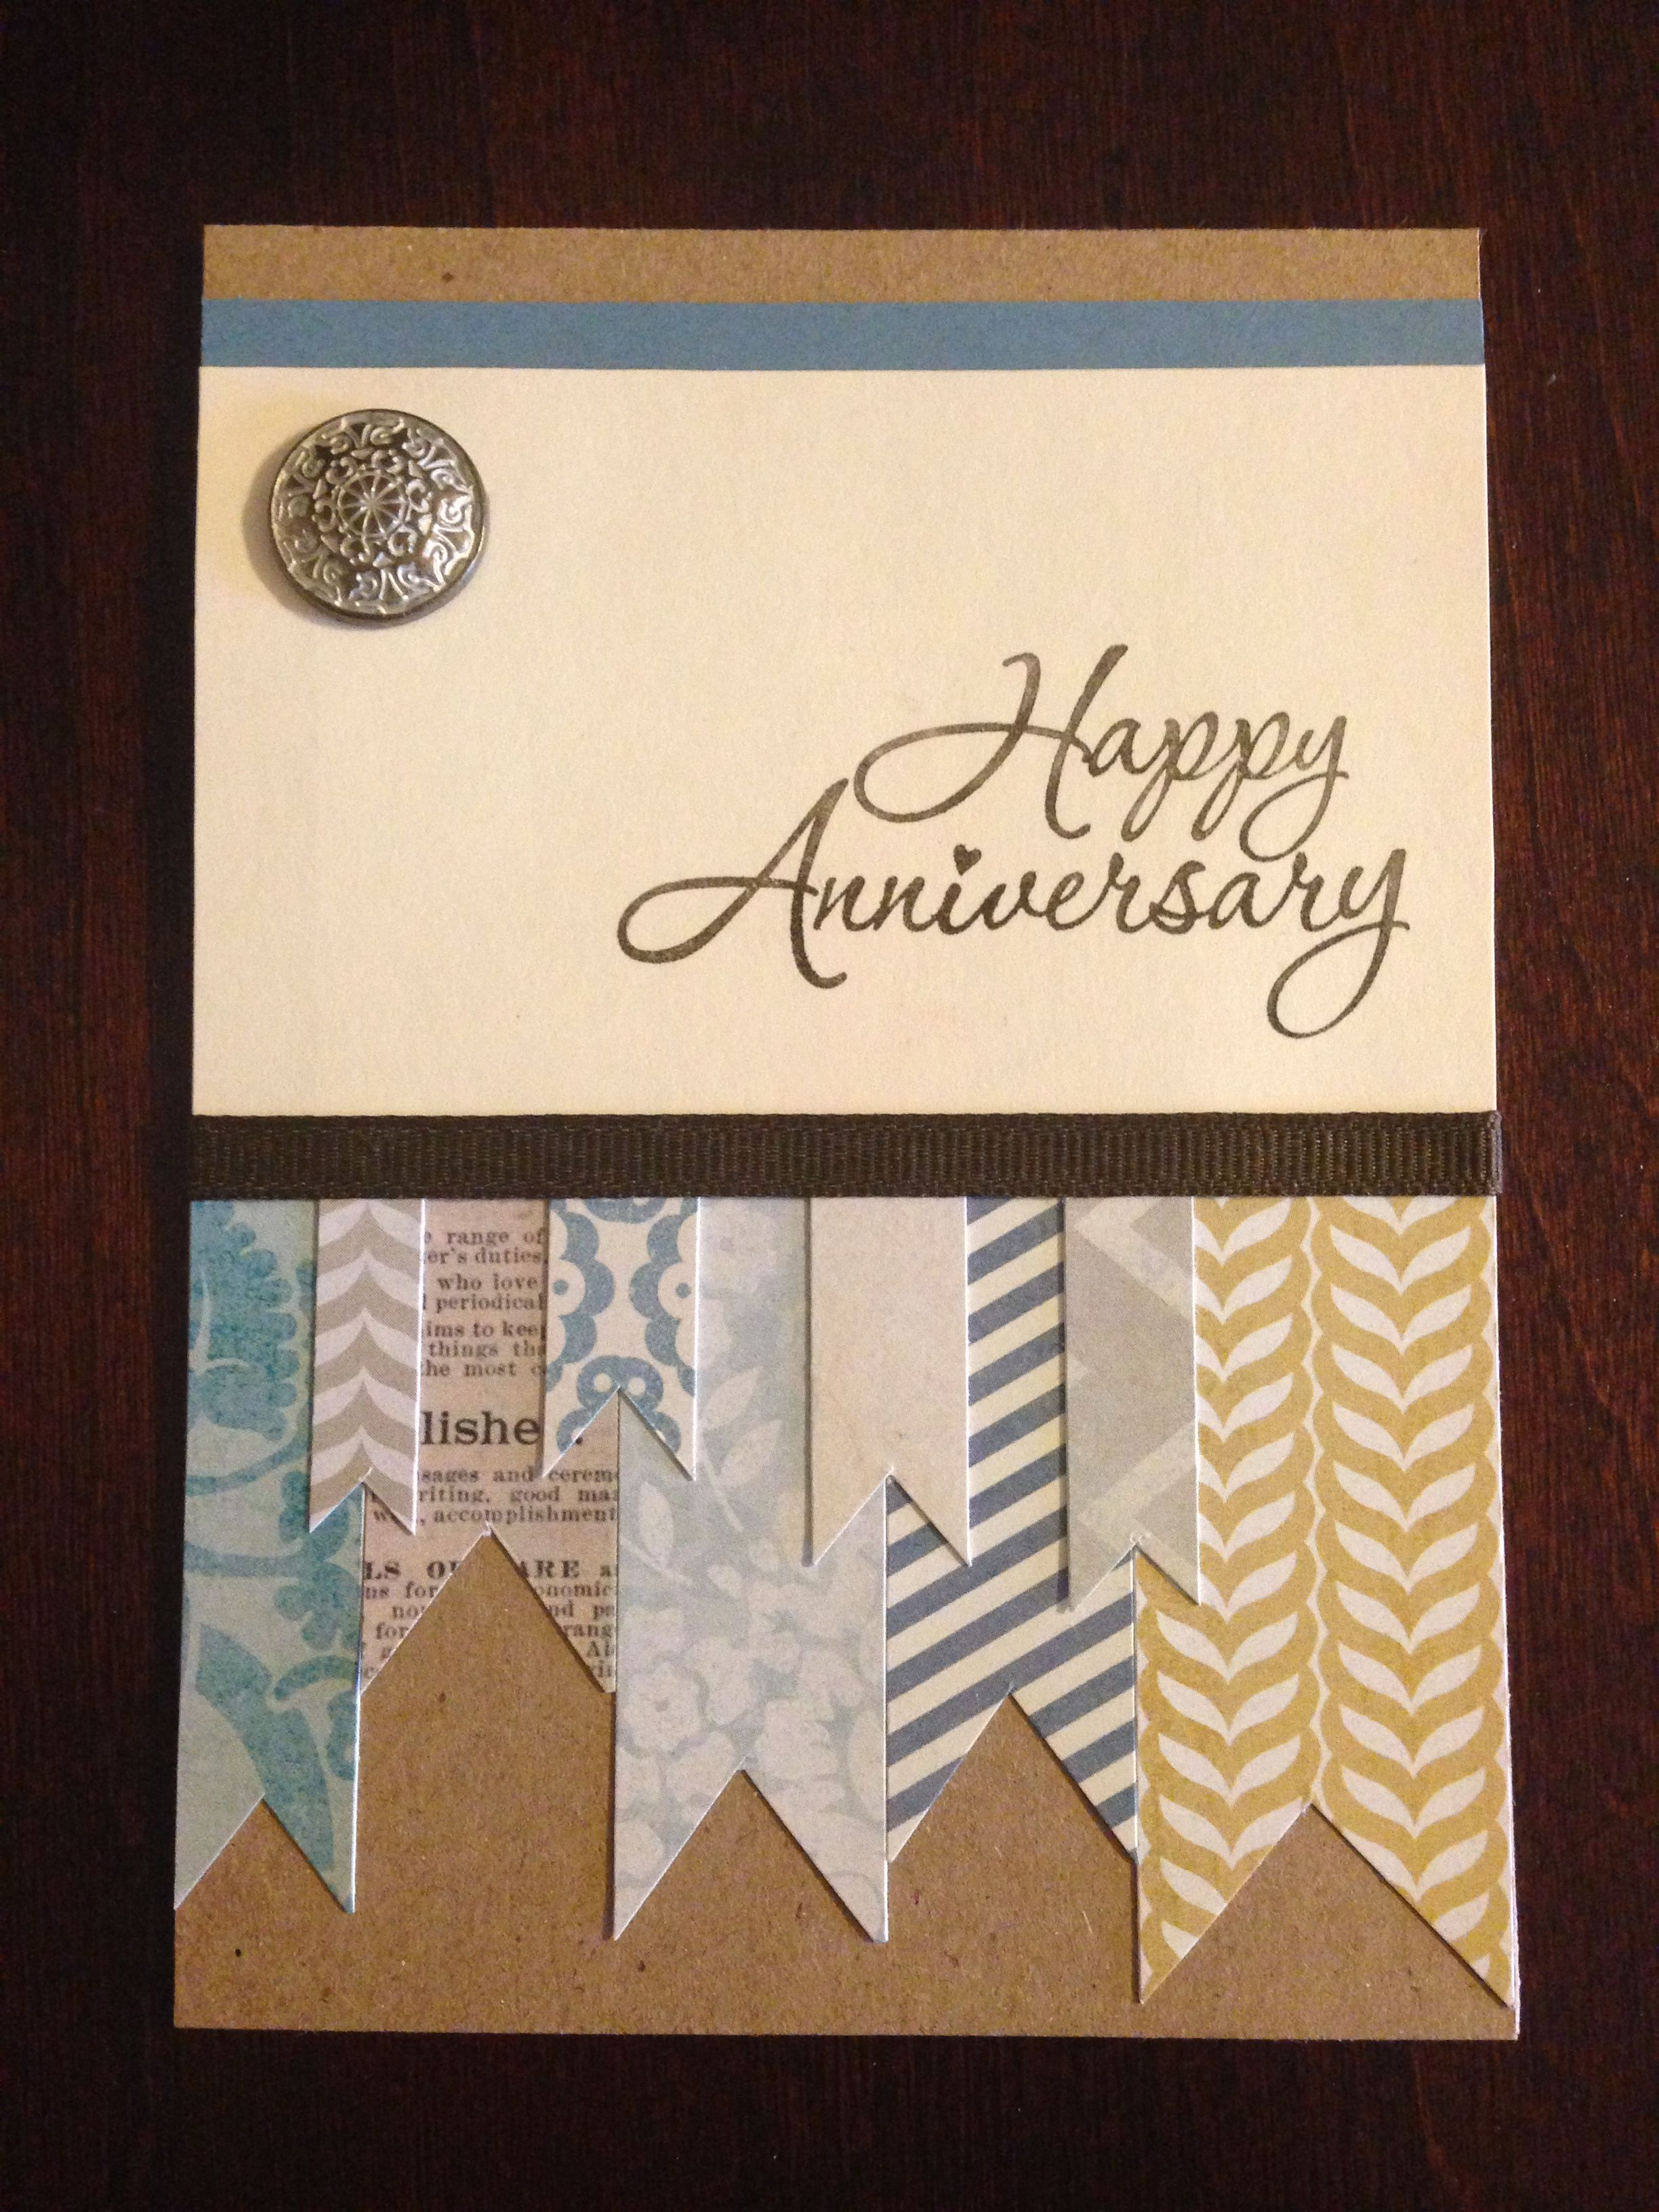 My Grandparents Anniversary Card Card Ideas Pinterest